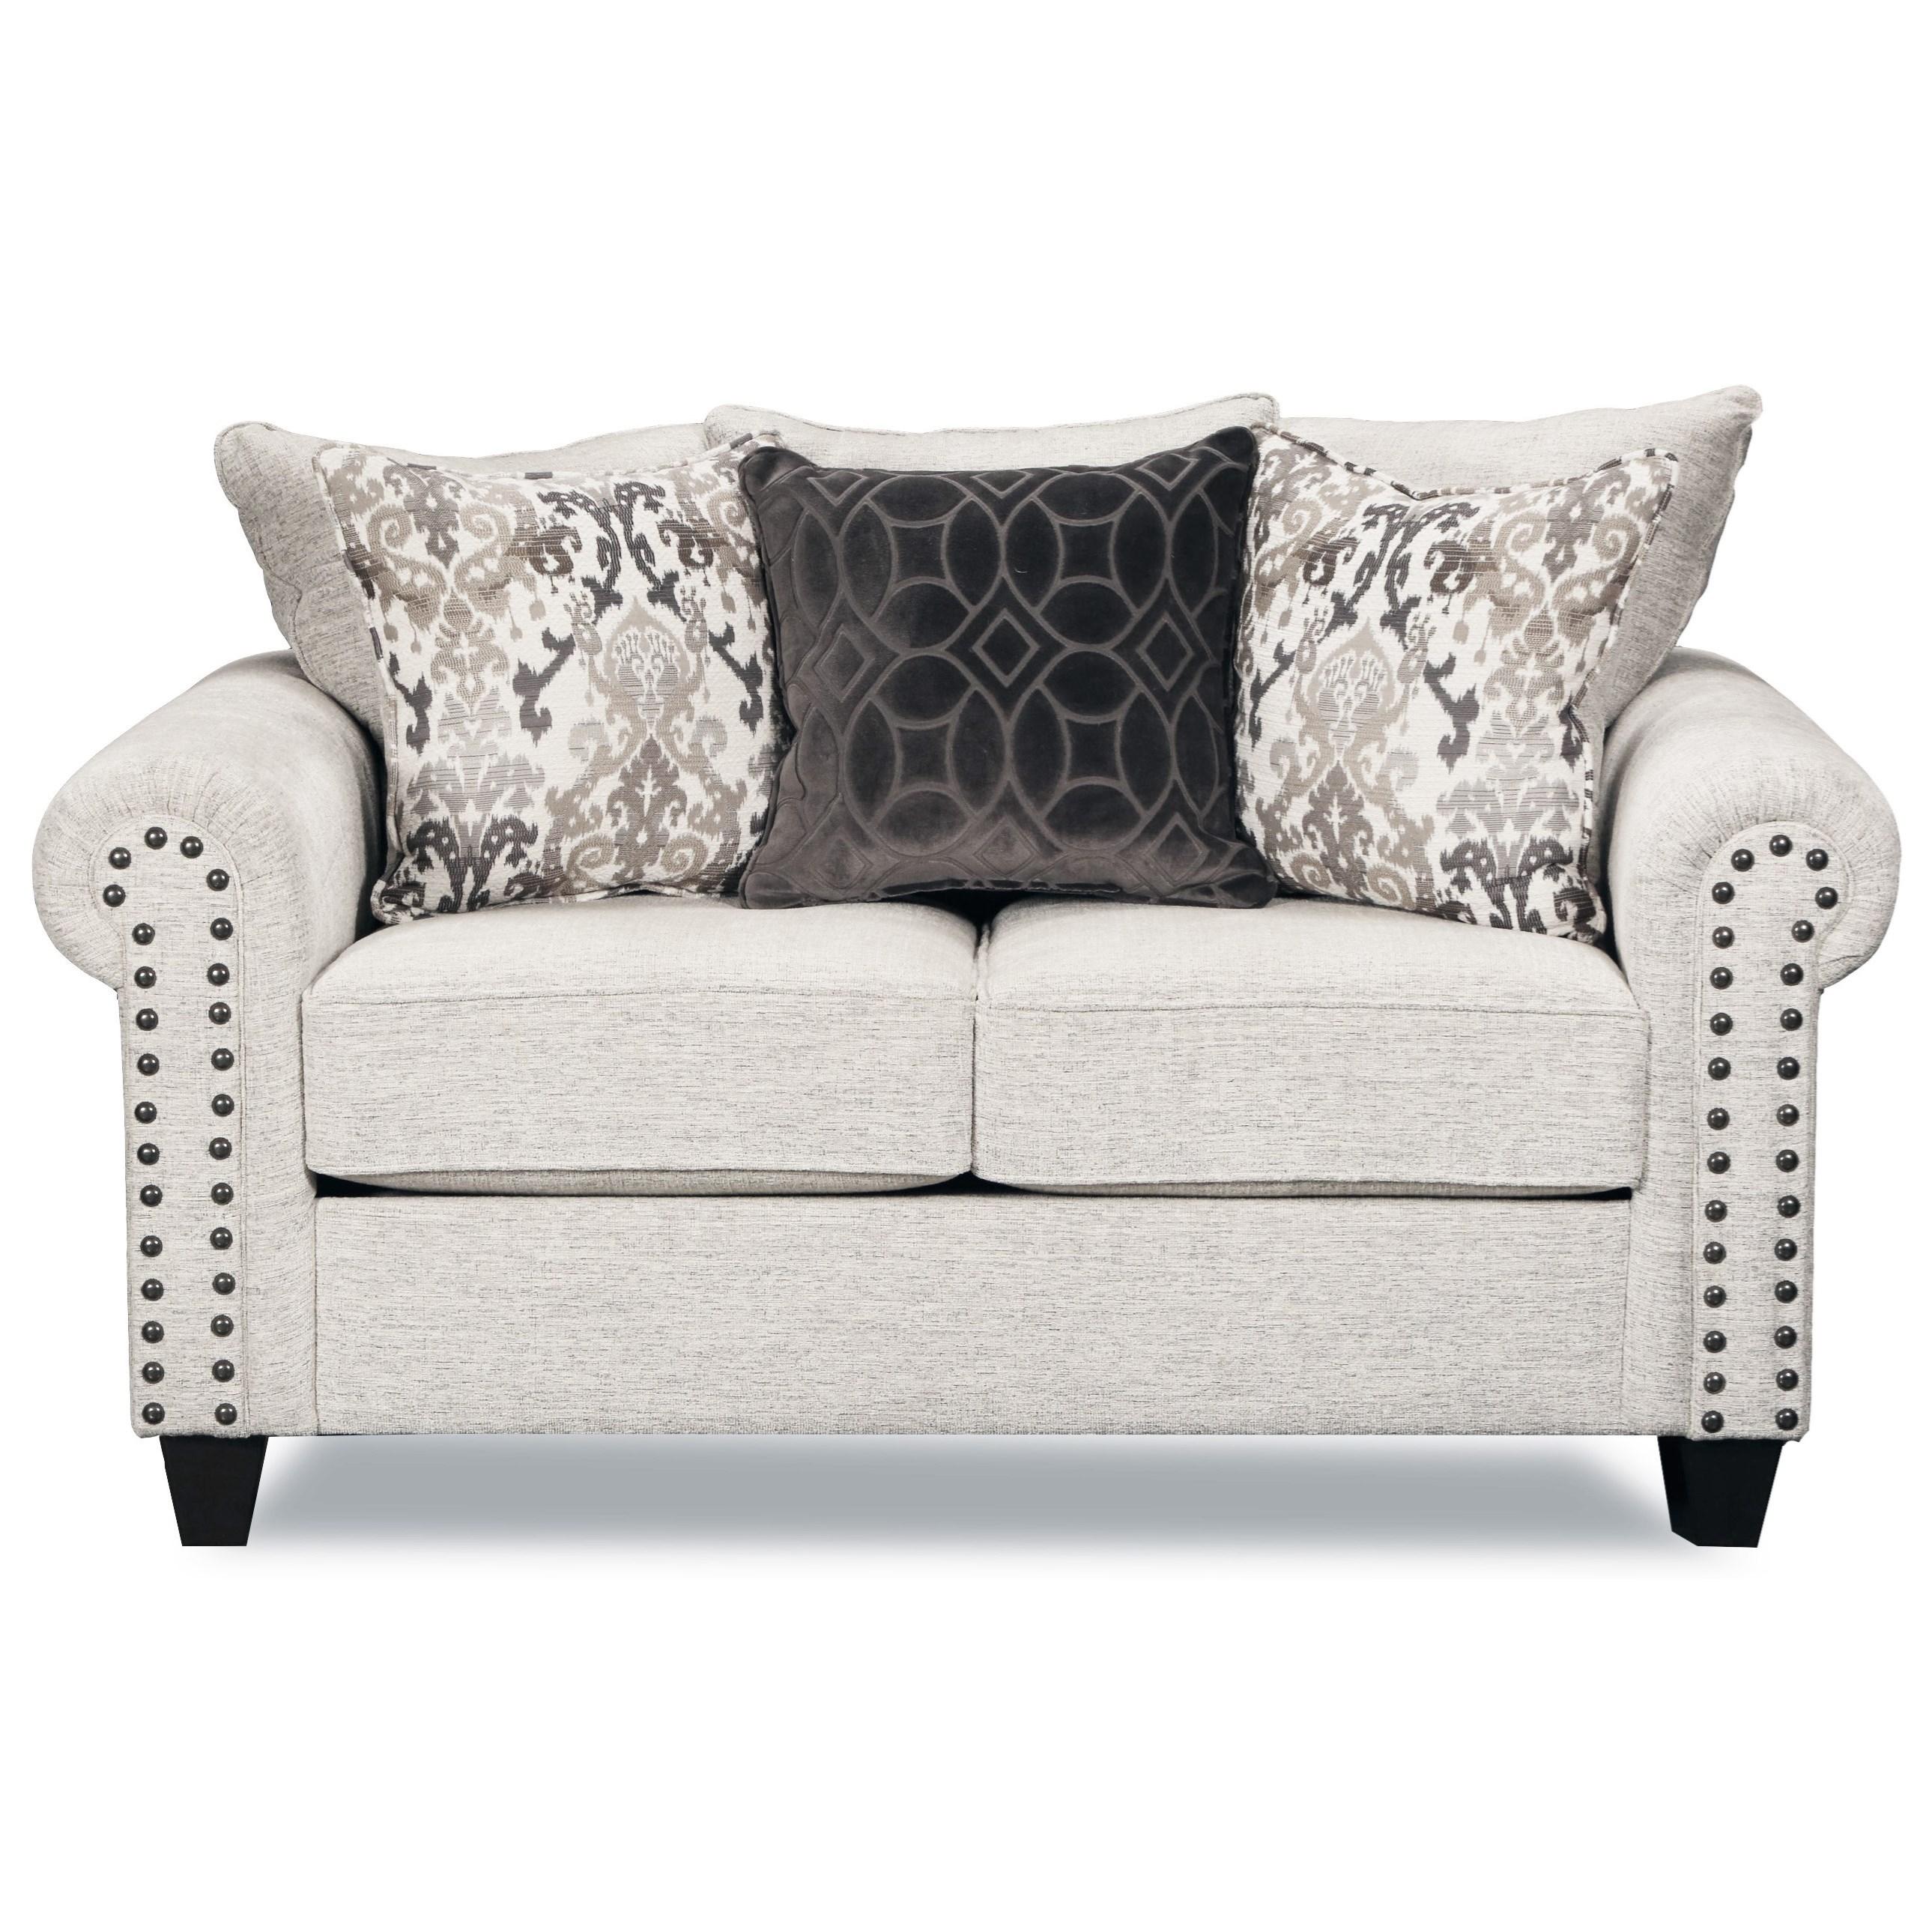 United Furniture Industries 9175BR Love Seat - Item Number: 9175BRLOVESEAT-Della Linen